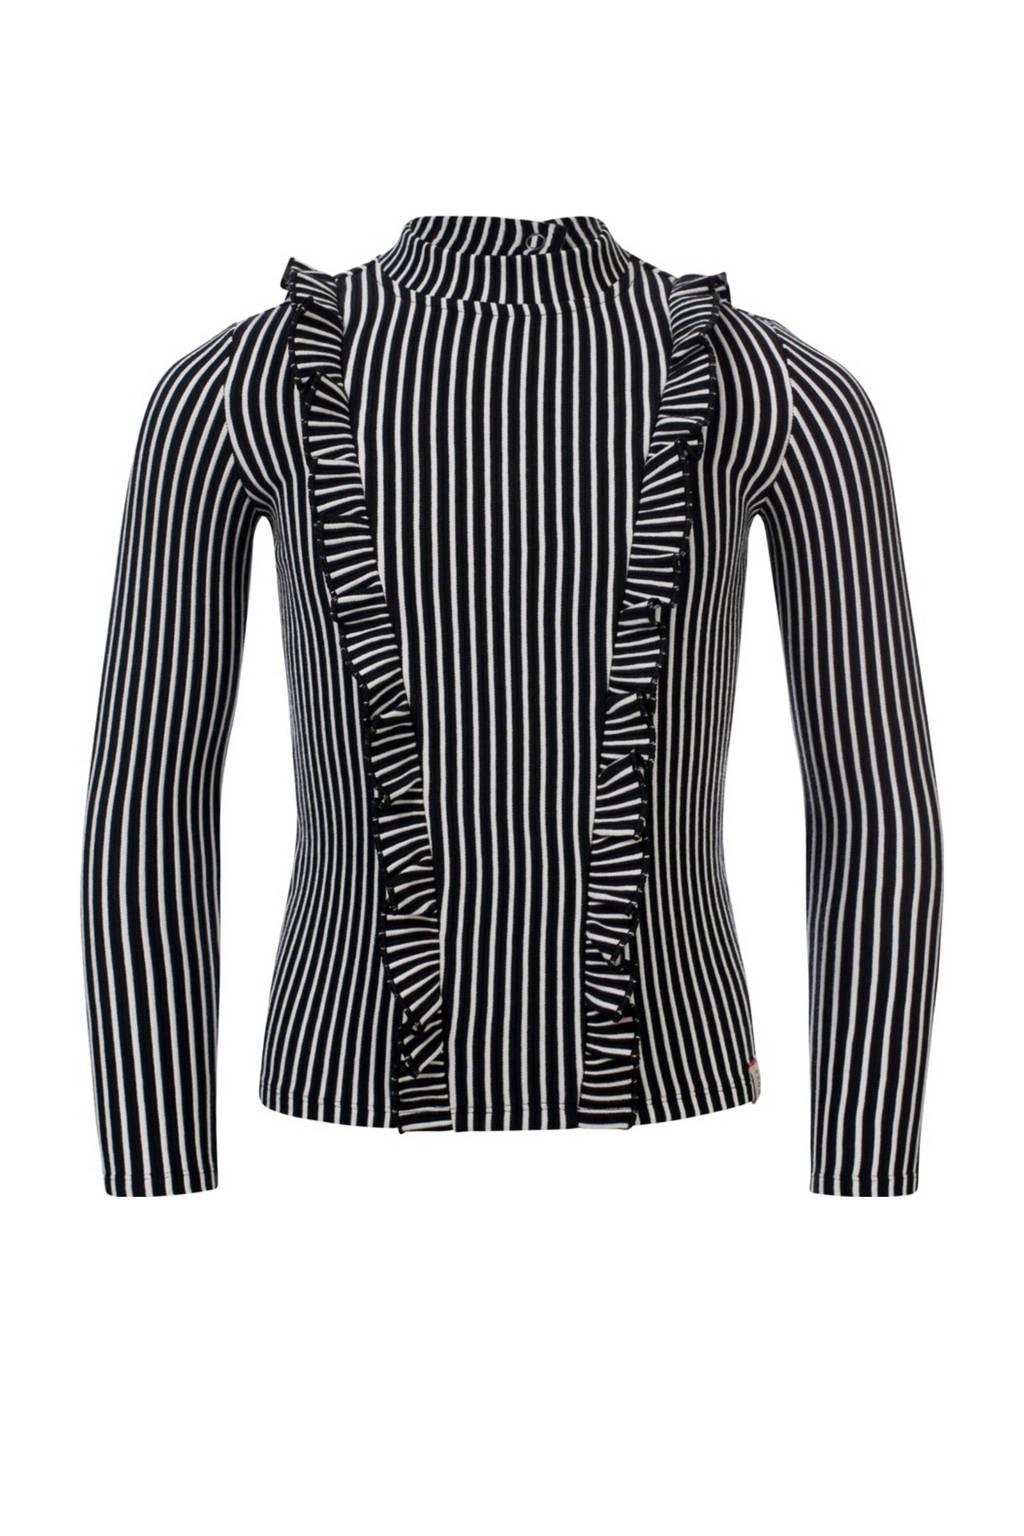 LOOXS 10sixteen gestreepte top zwart/wit, Zwart/wit